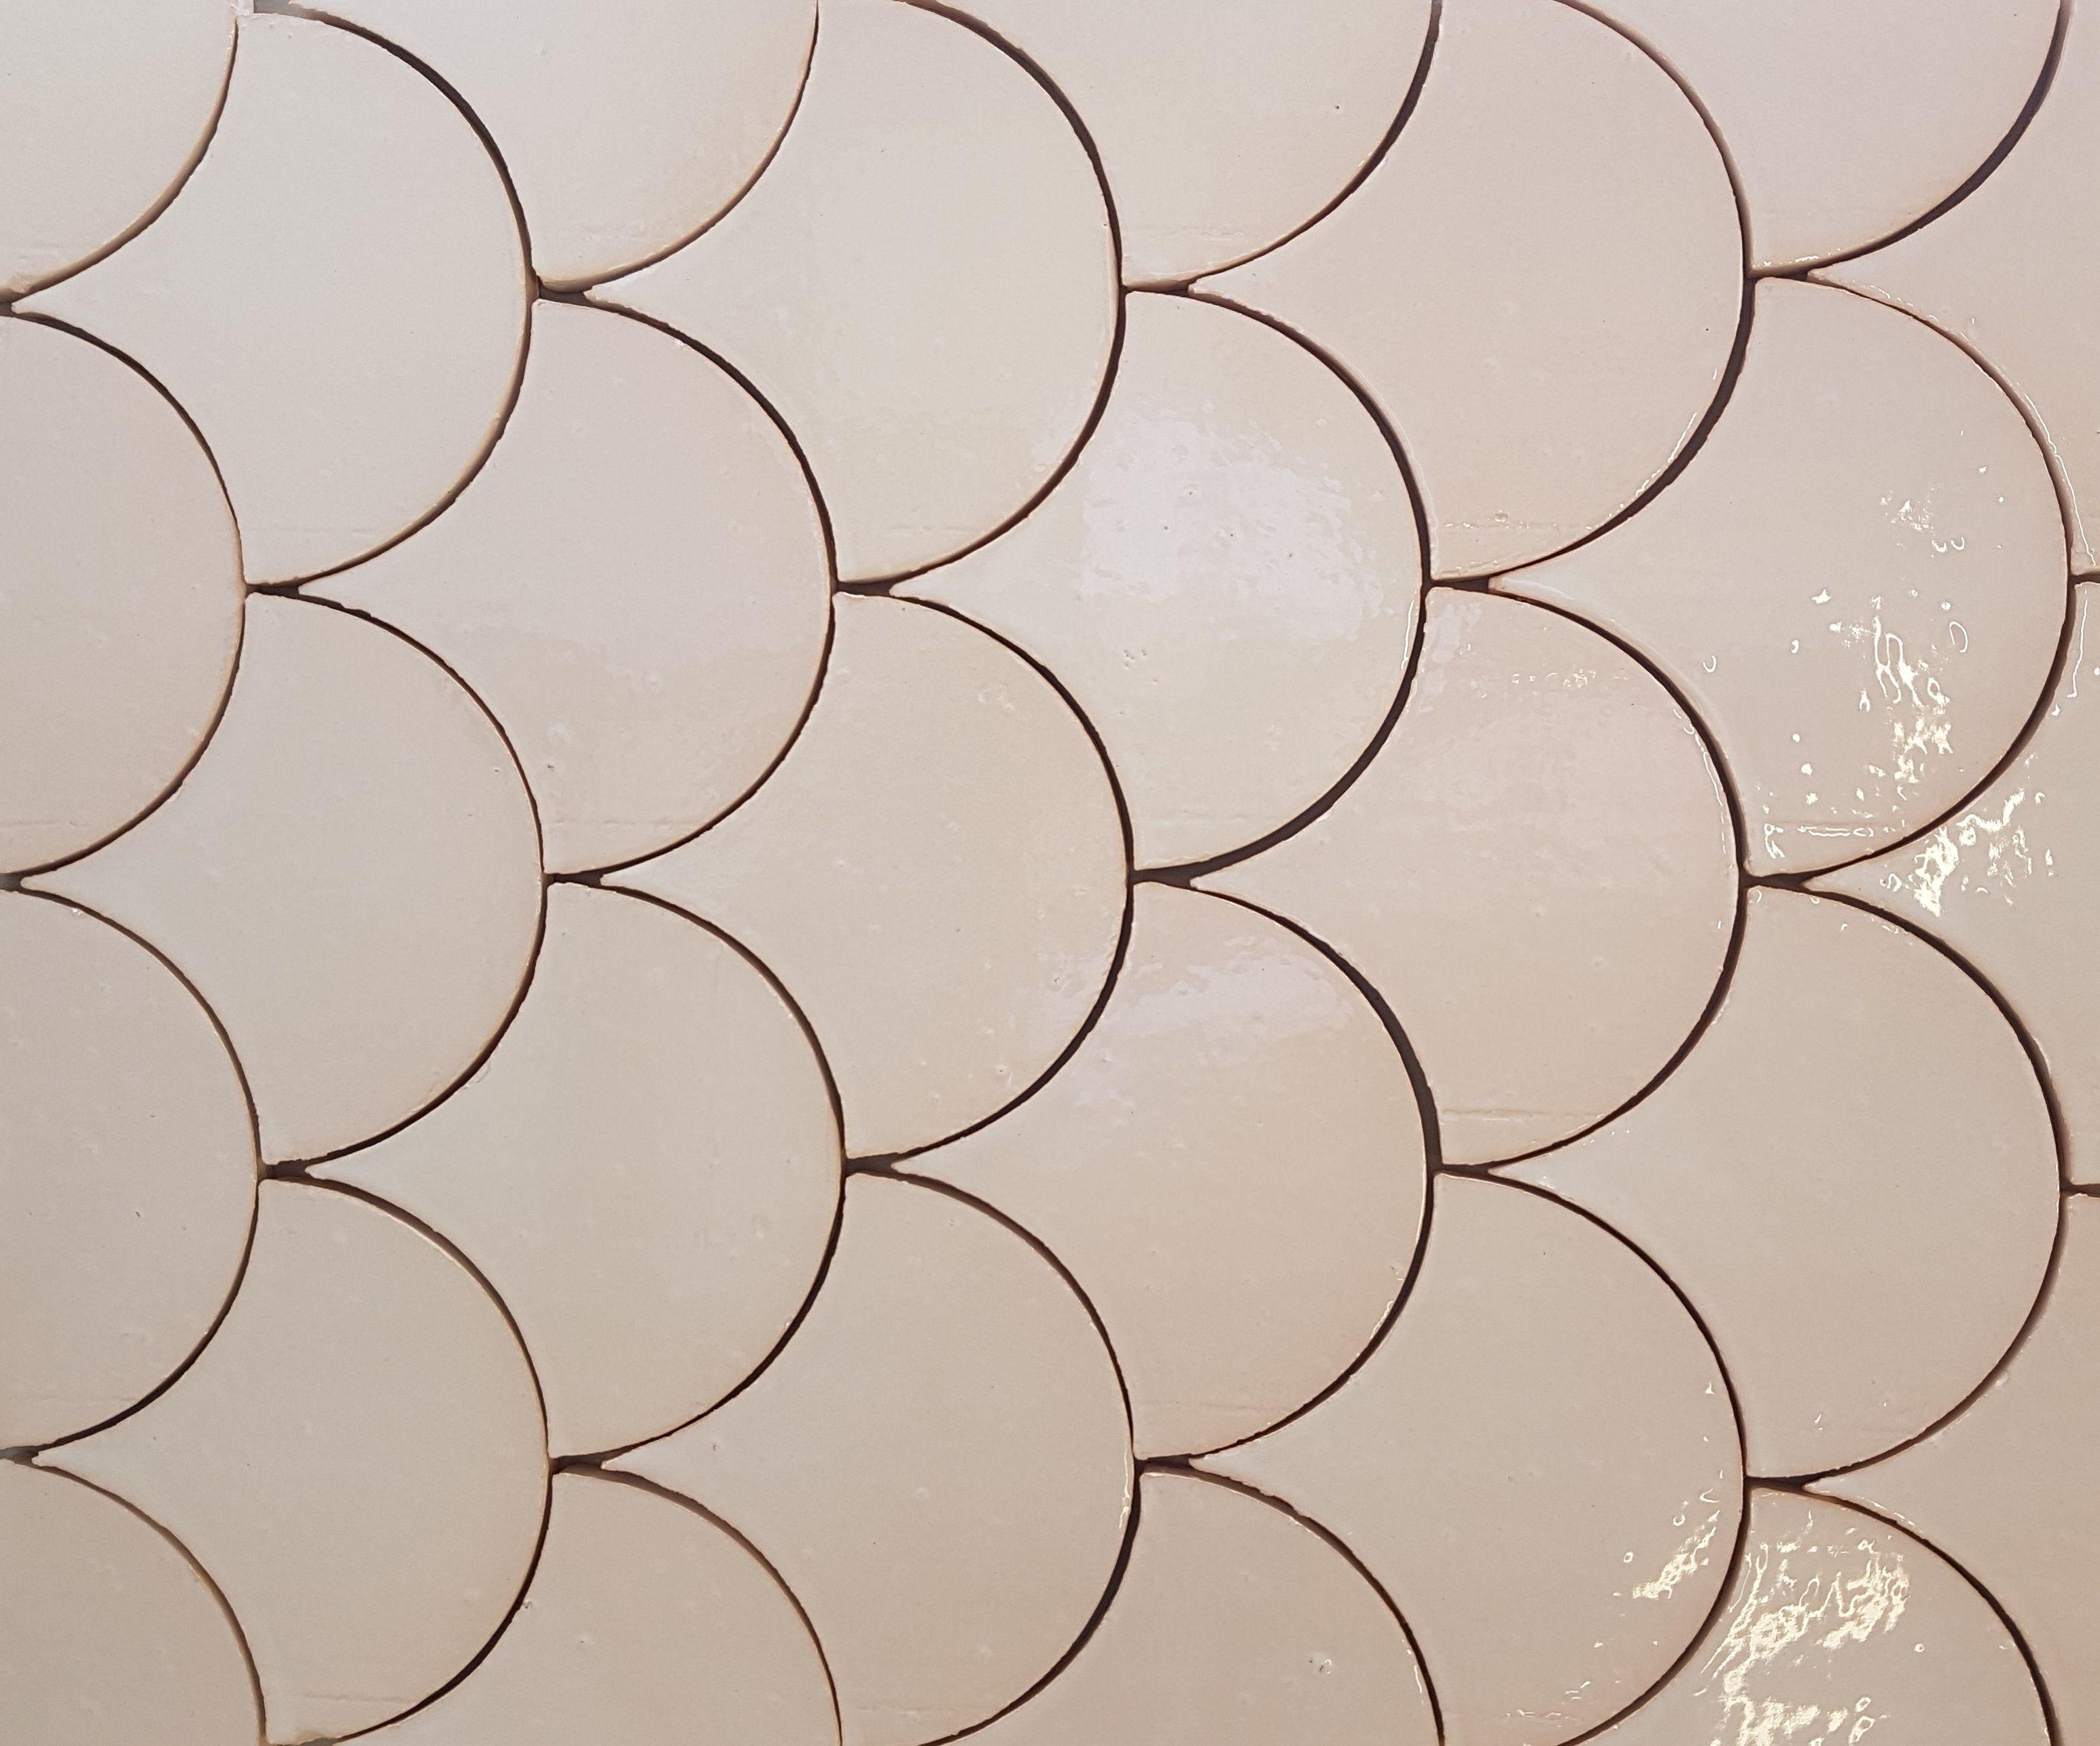 Ecailles En Terre Cuite Emaillee Zelliges Art Deco Design Terre Cuite Carrelage Mural Cuisine Faience Cuisine